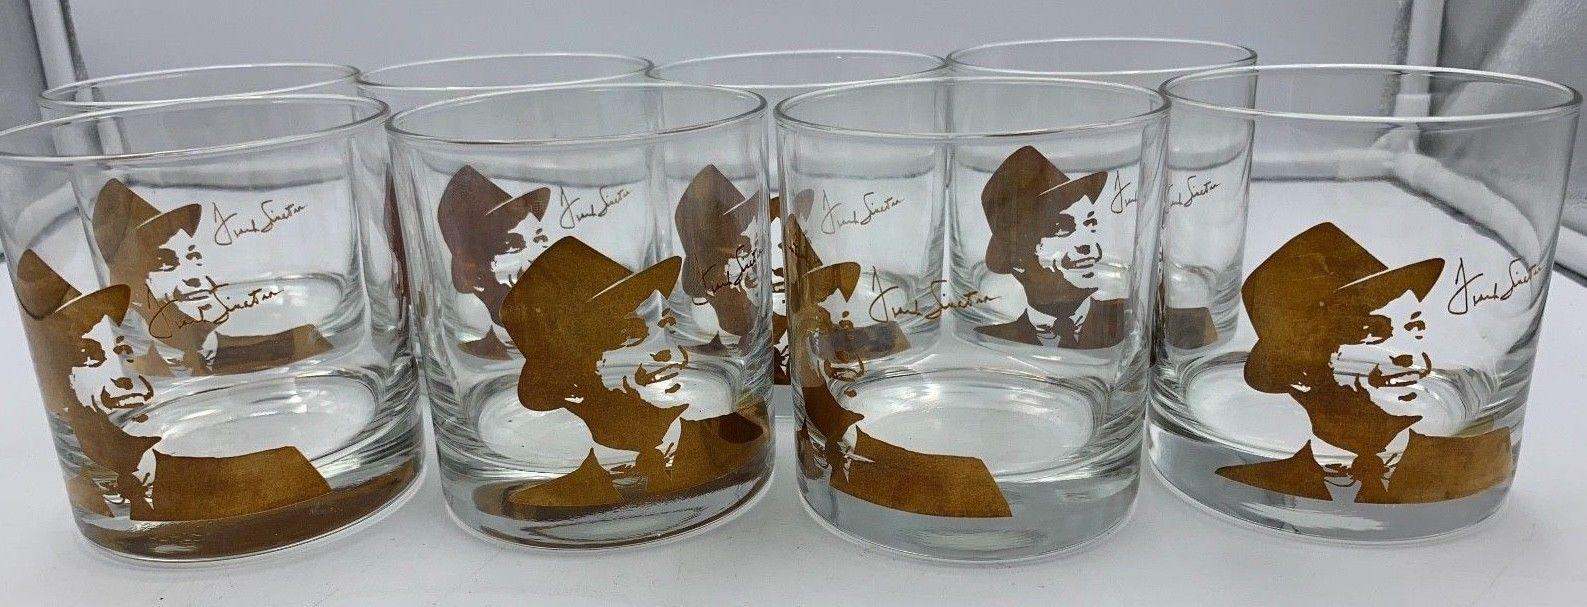 Frank Sinatra 18k gold applied low ball rock glasses - glassware x 8 MCM EUC